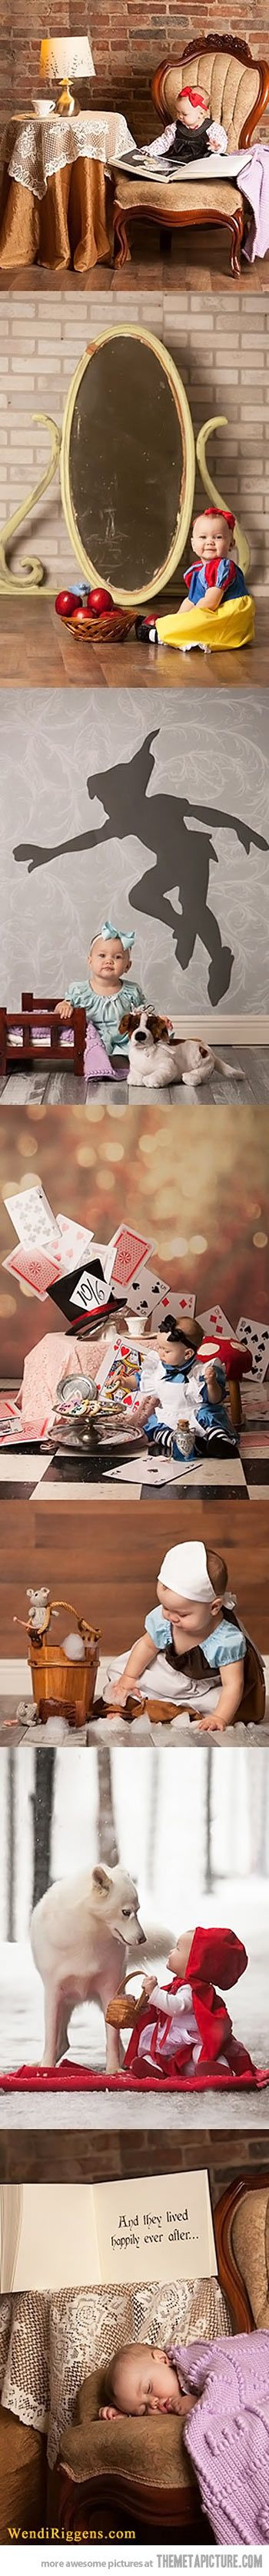 Cutest baby fairy tale pics! <3